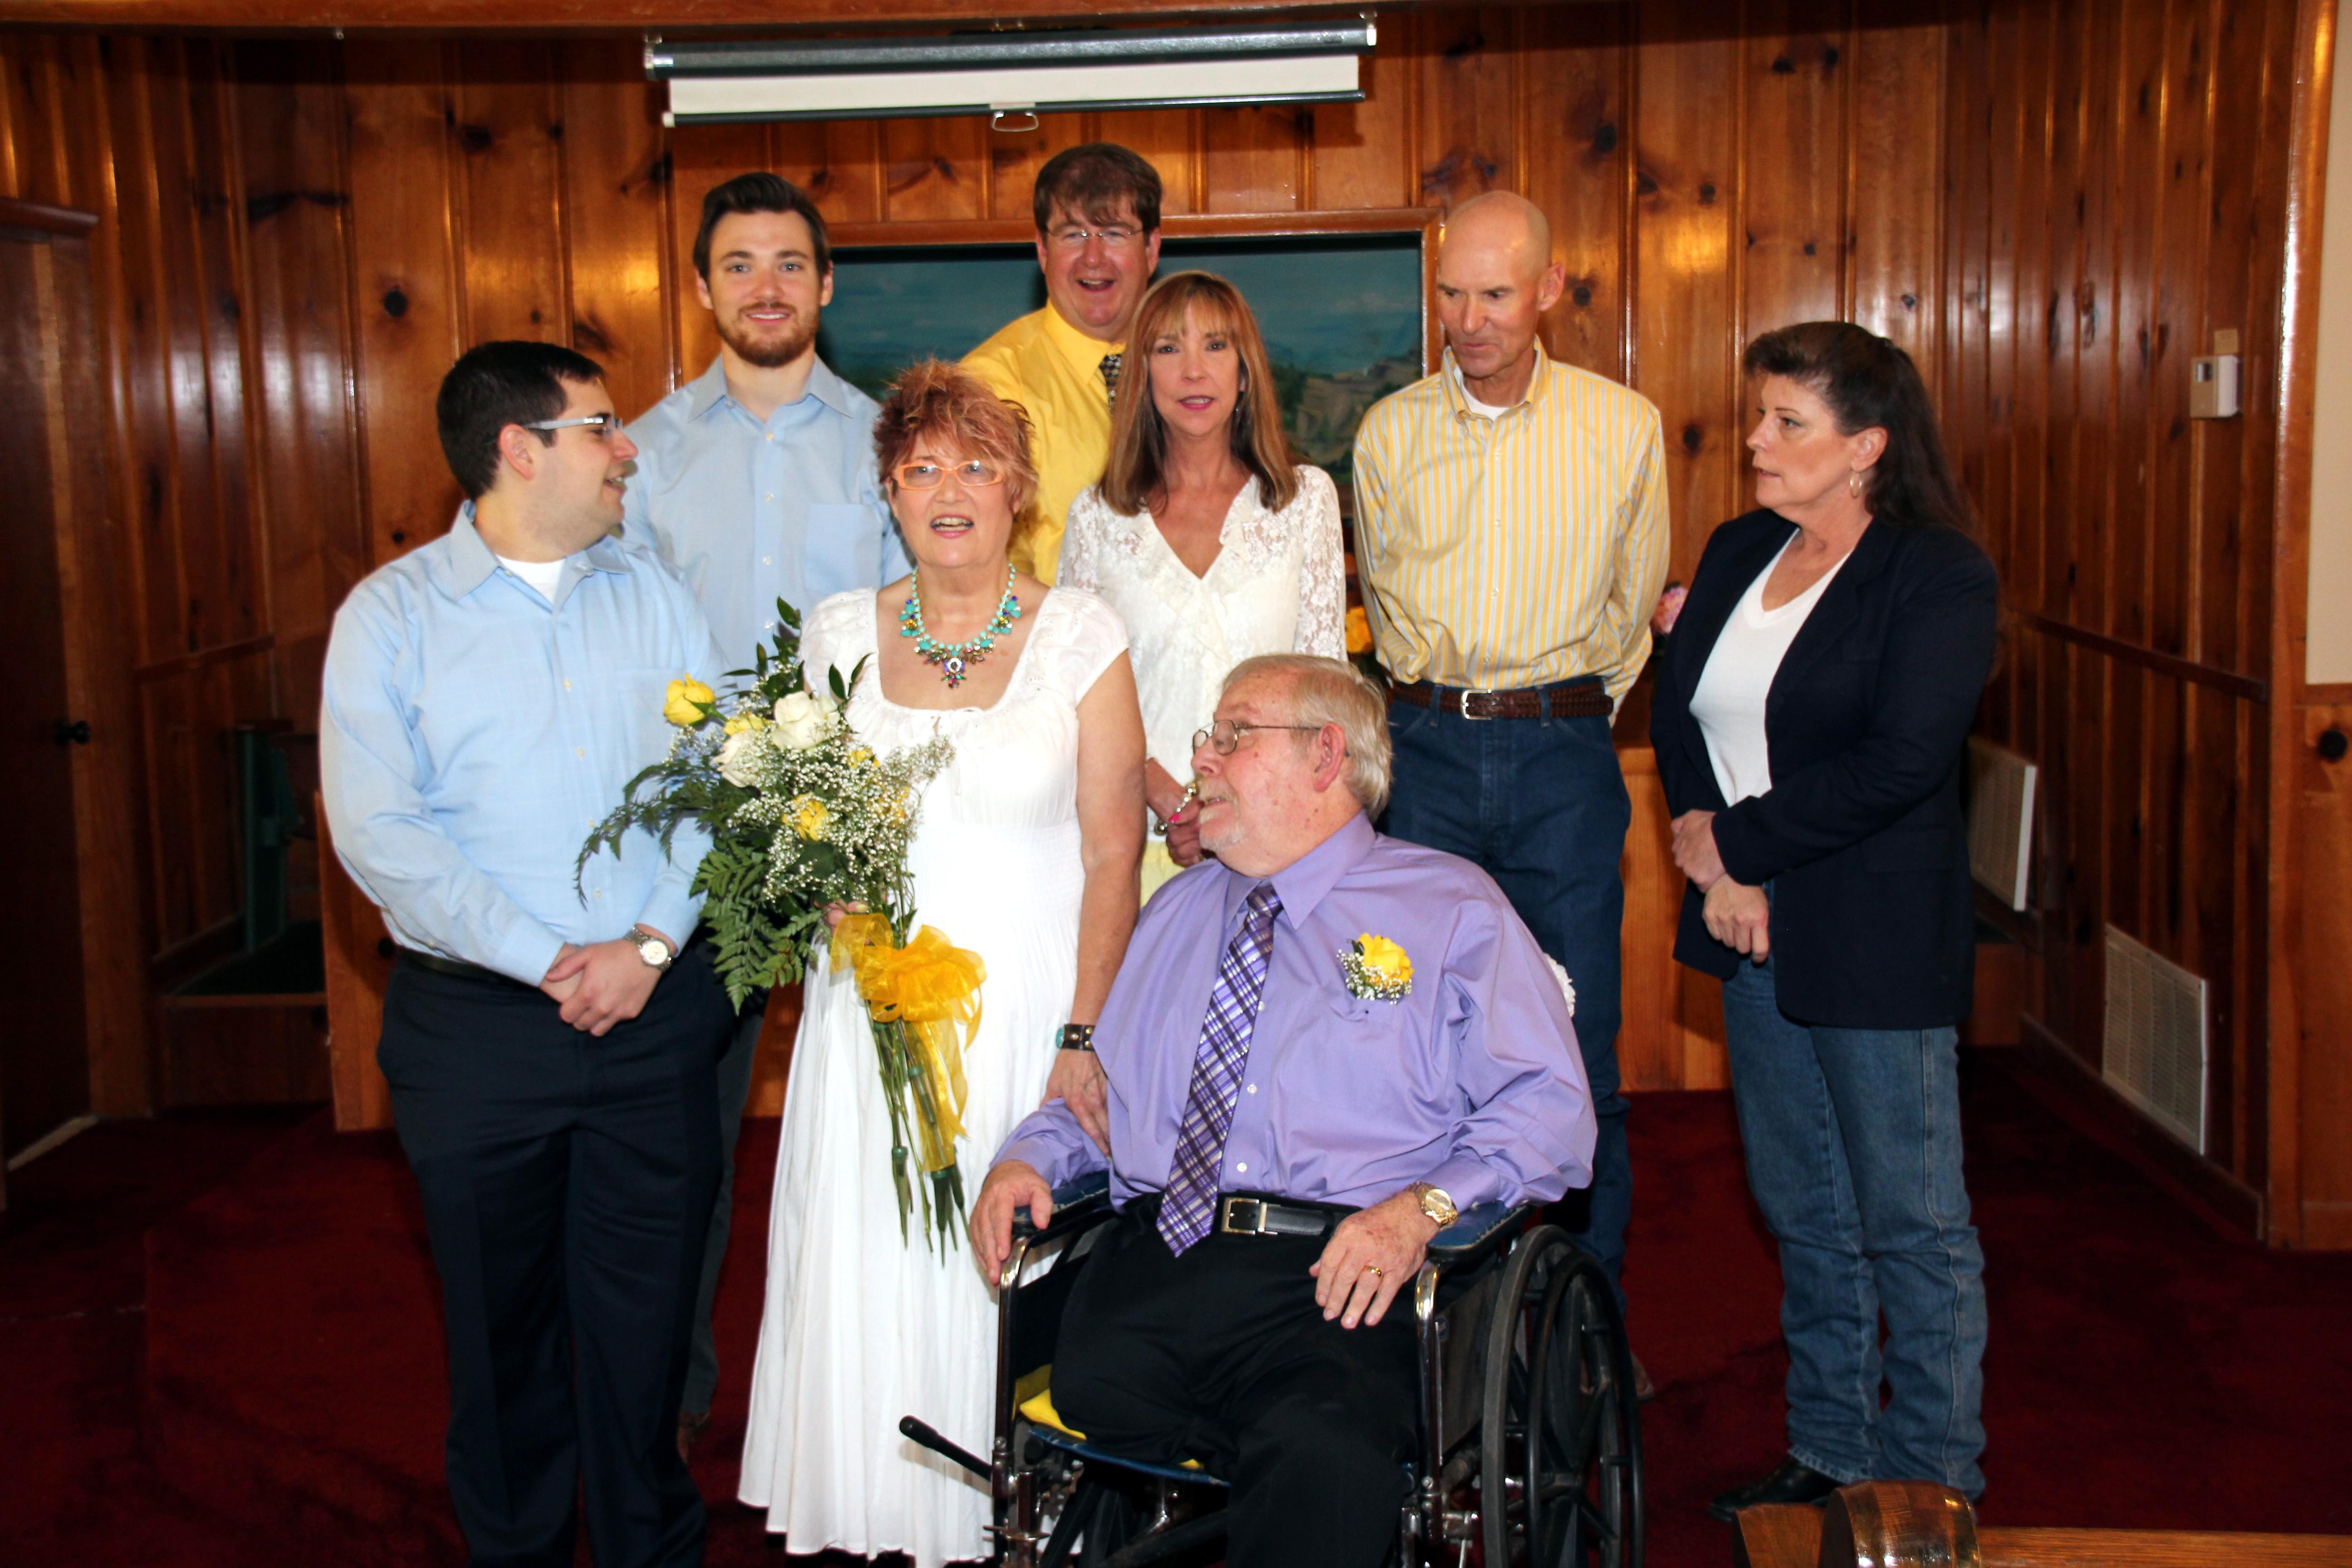 Diane's Wedding